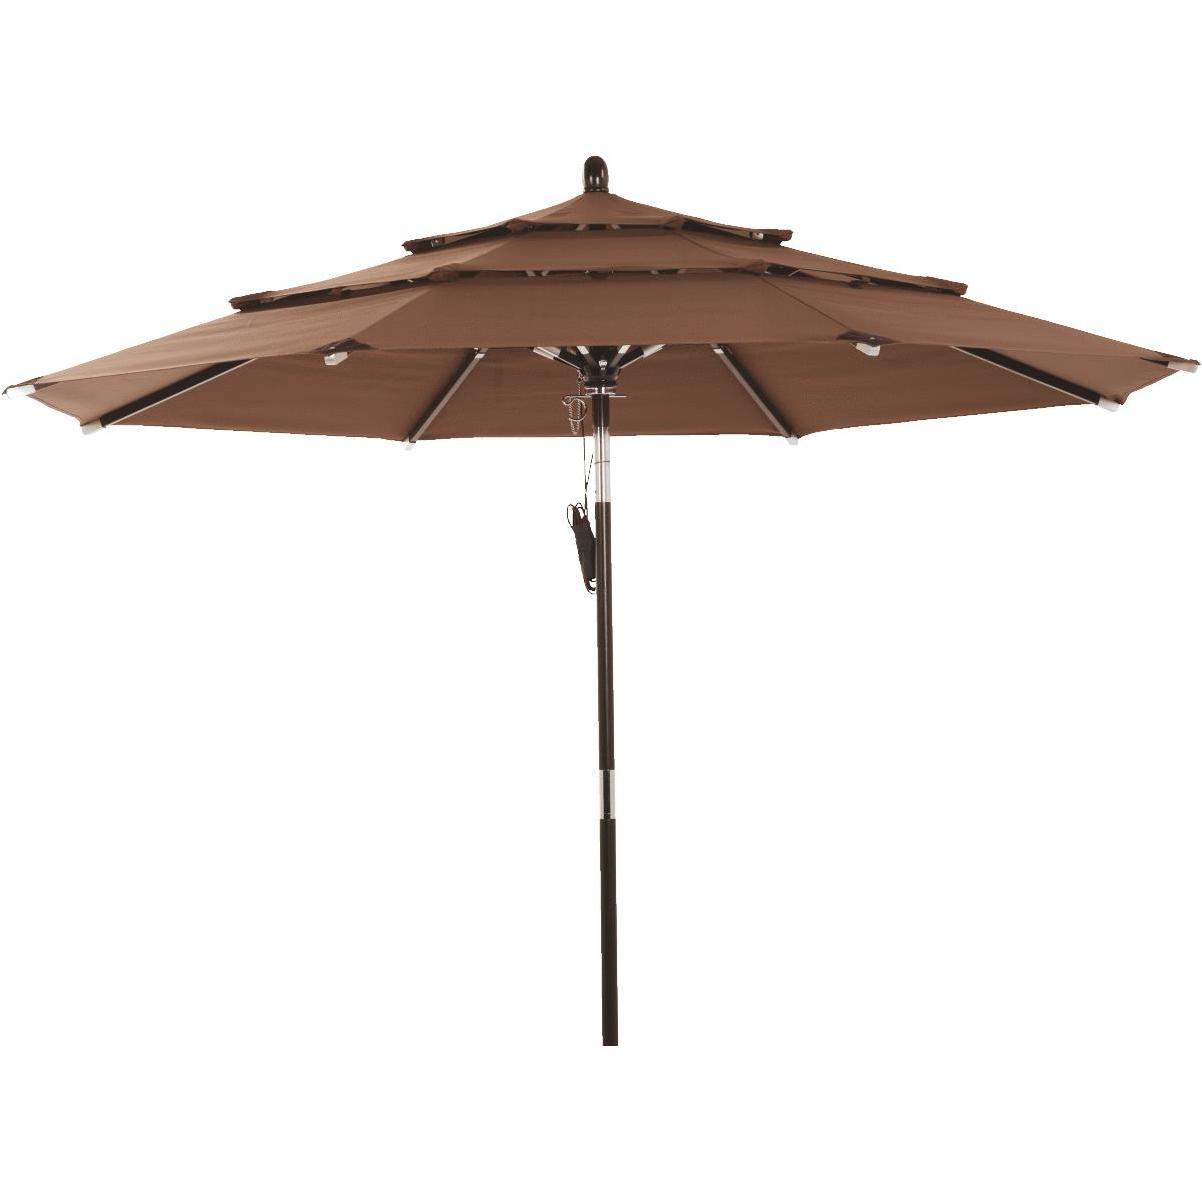 https bloomerhardware com products 800703 outdoor expressions 9 ft 3 tier tiltpulley brown patio umbrella